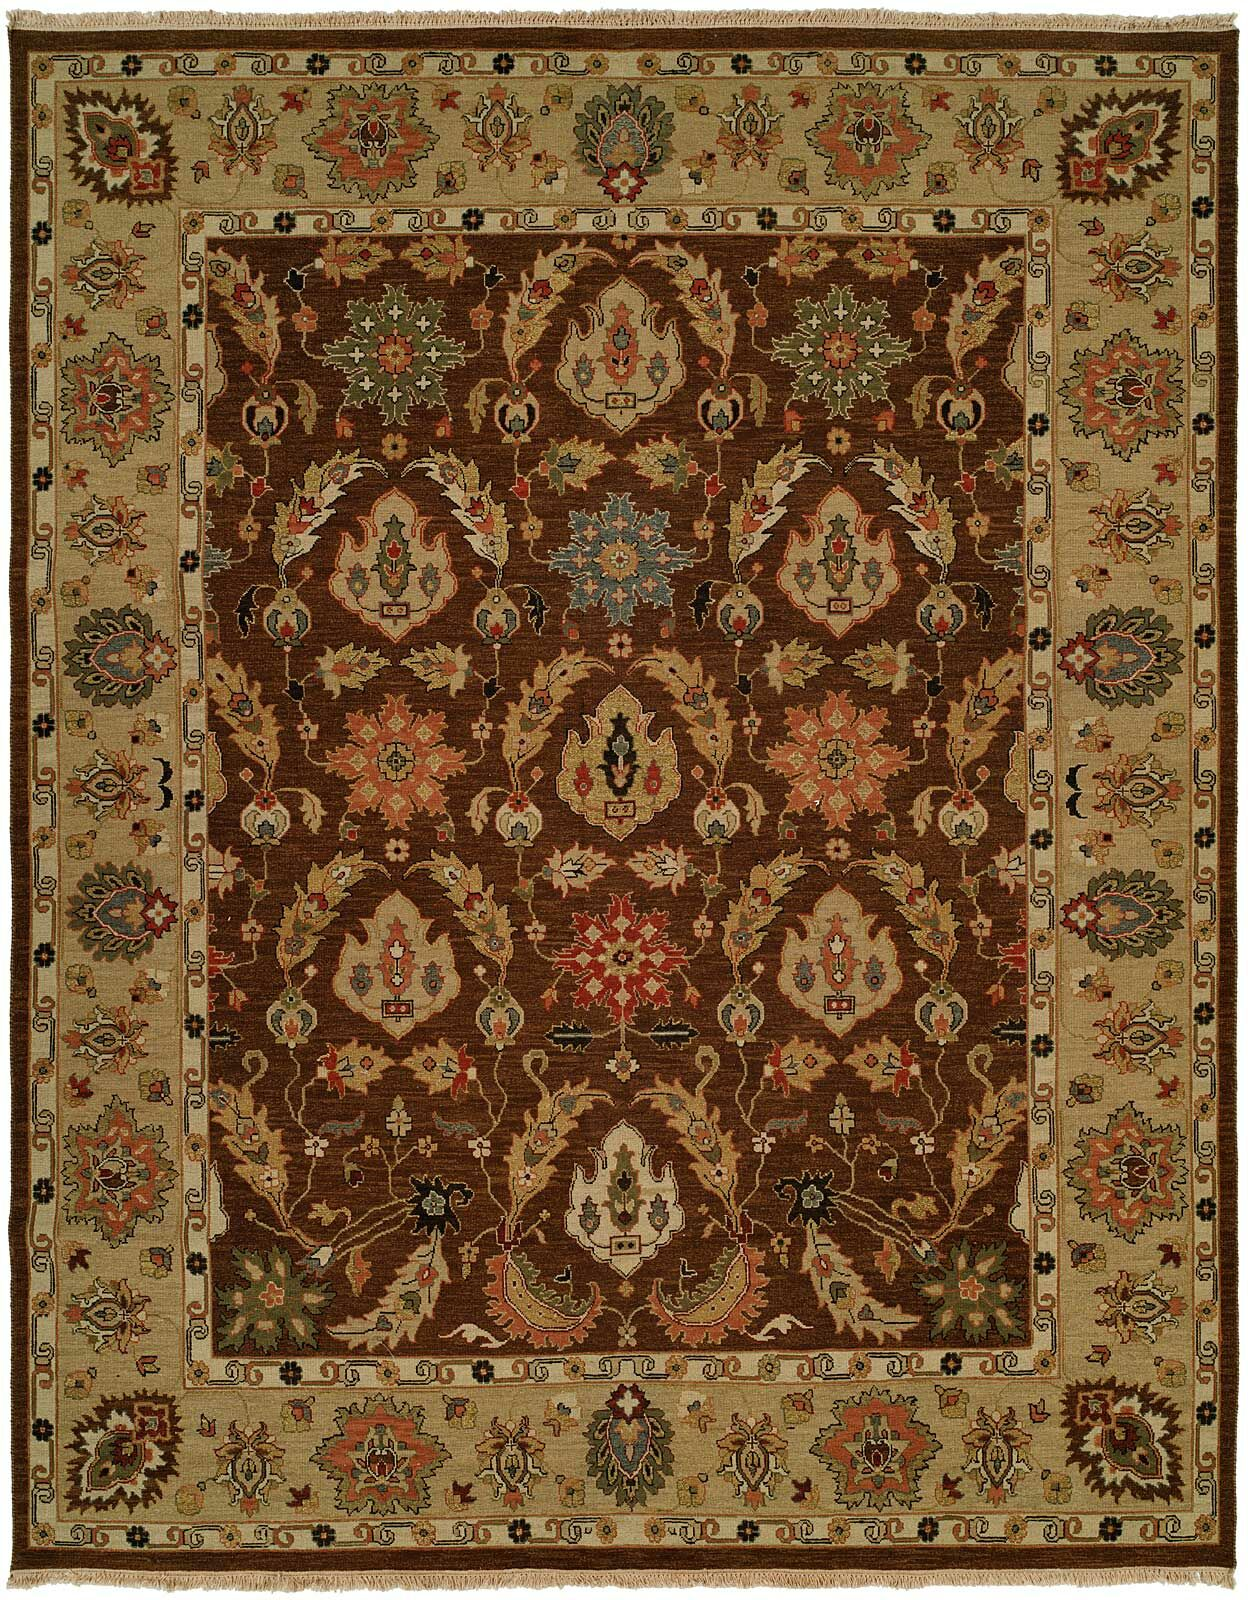 Acapulco Hand-Woven Brown/Camel Area Rug Rug Size: Rectangle 10' x 14'